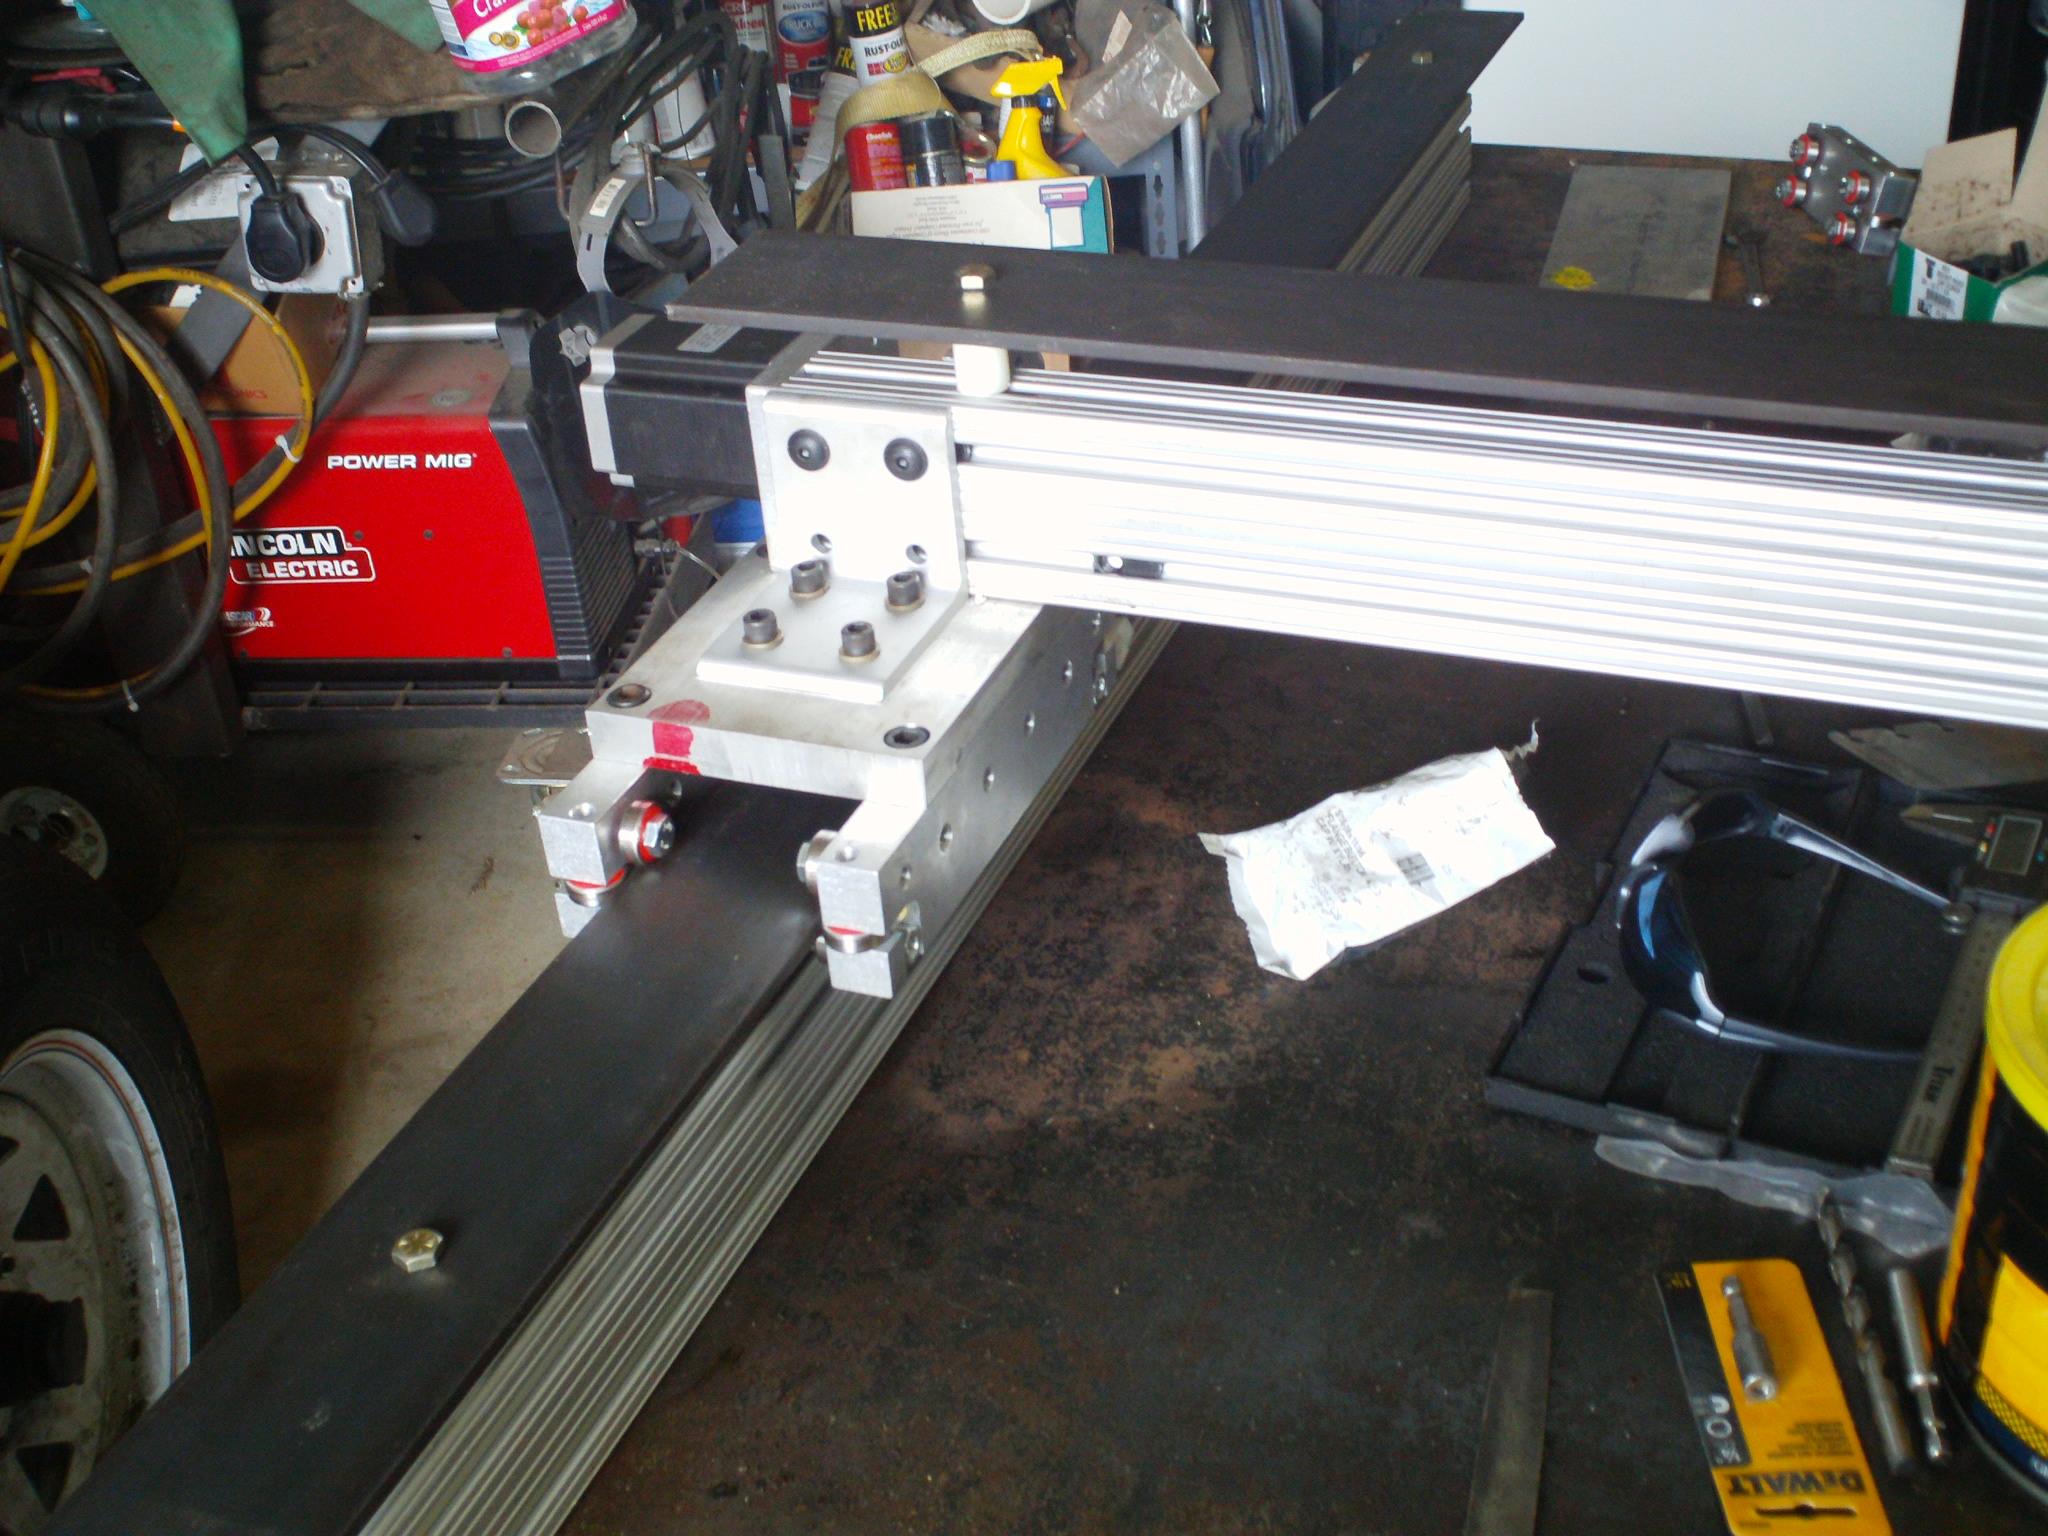 cnc plasma cutter | frugaltinker